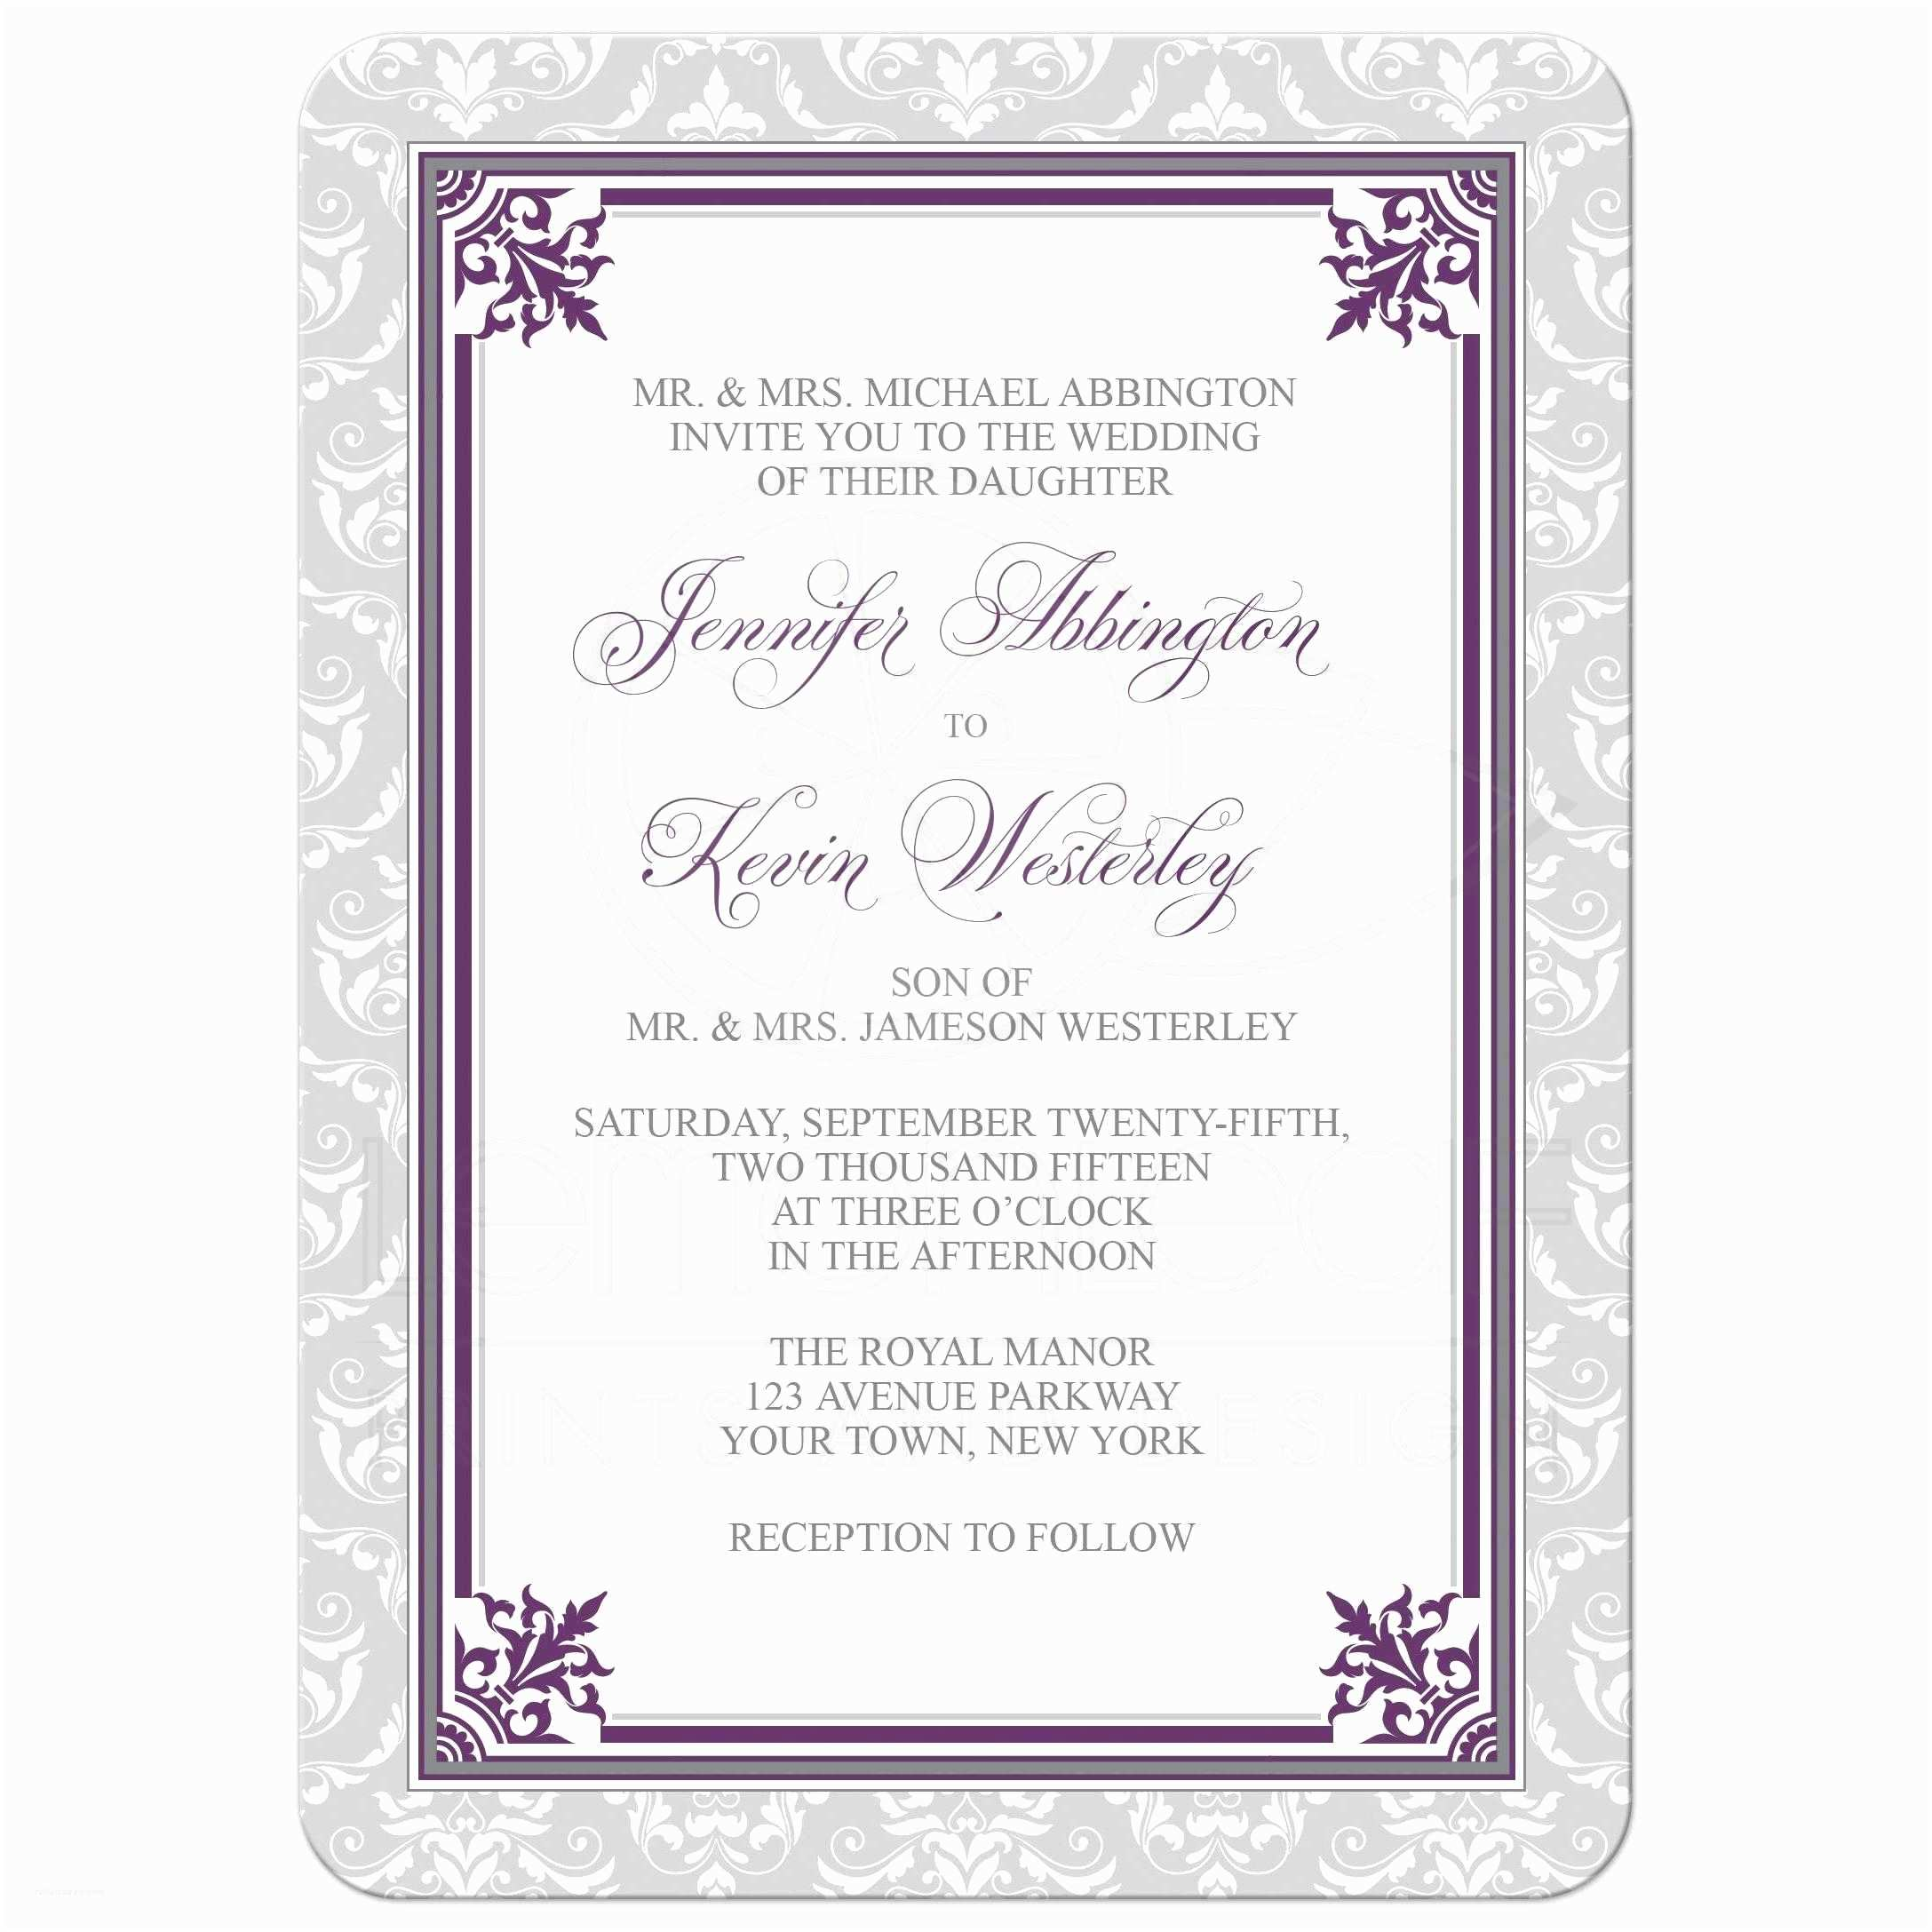 Plum Wedding Invitations Wedding Invitations Plum Purple and Gray Elegant Damask